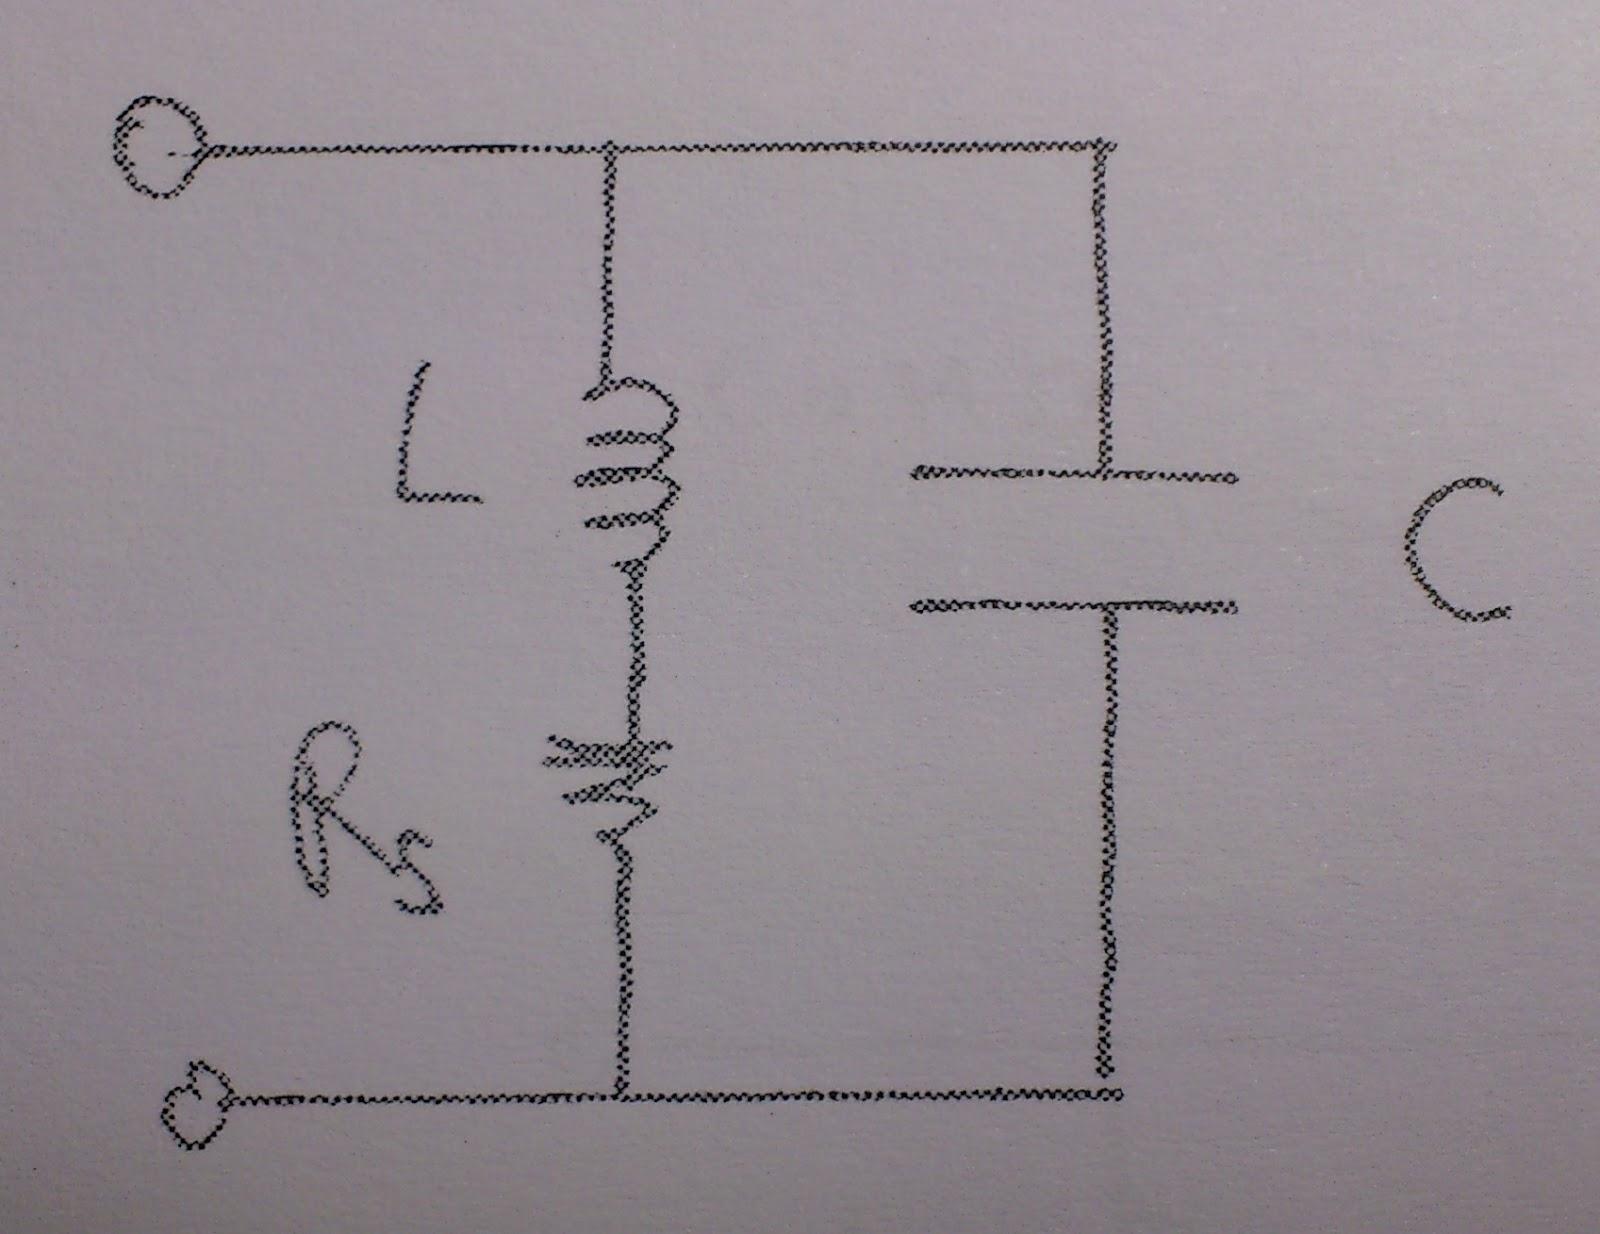 Circuito Rl : Me salva rlc circuito rl exemplo i eletrotécnico